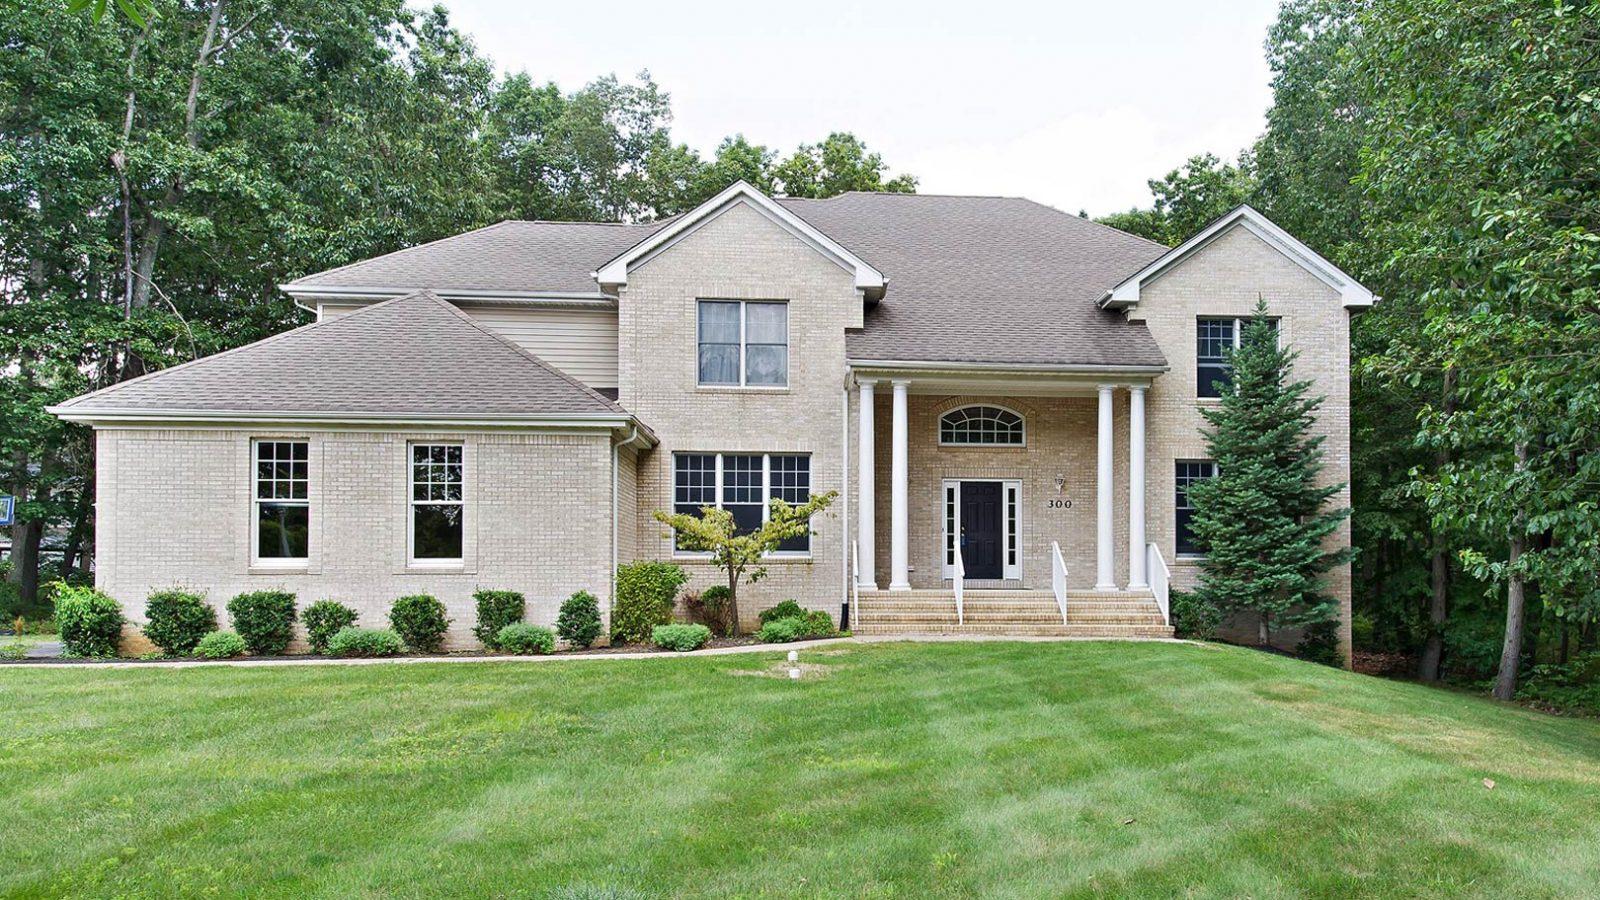 joanna-siminerio-manalapan-new-jersey-real-estate-homes-2